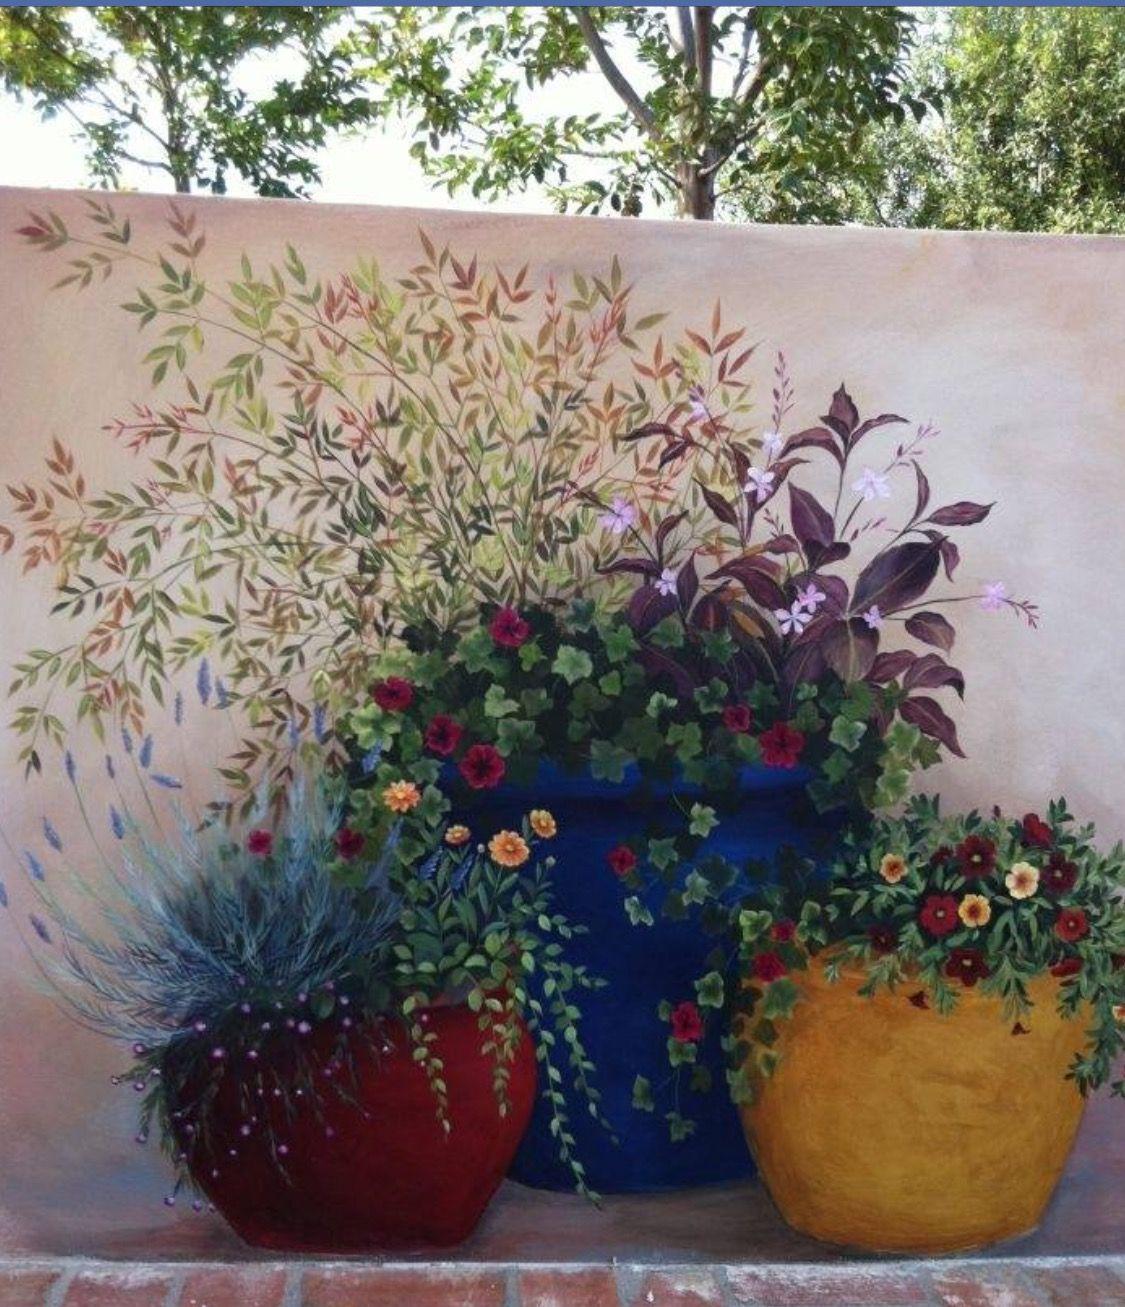 Outdoor Garden Wall Art: Garden Wall Painting - Gardening And Living